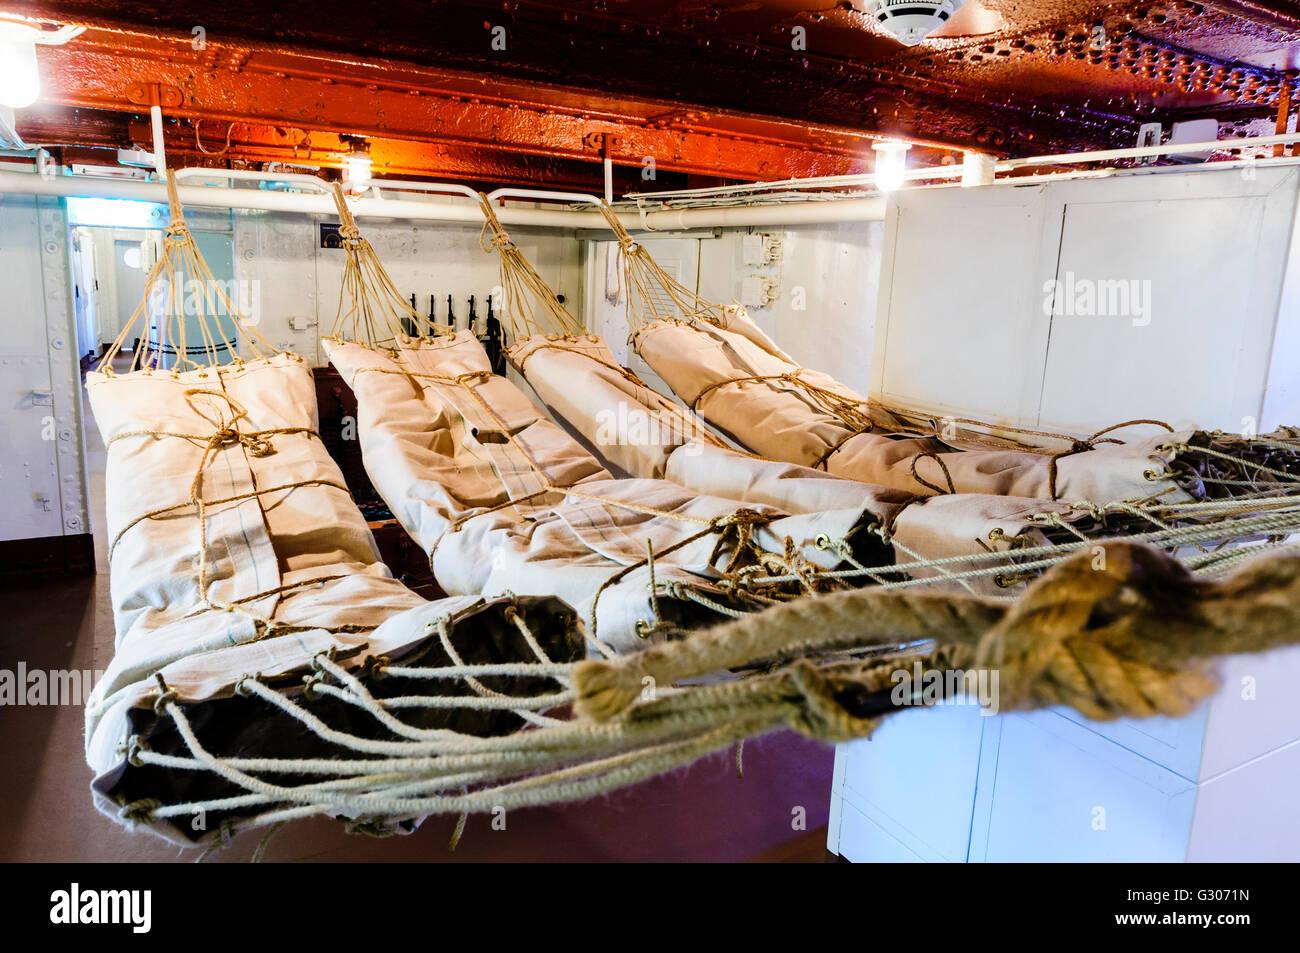 Crew member's hammocks on HMS Caroline, Belfast, the last surviving ship from the Battle of Jutland. - Stock Image